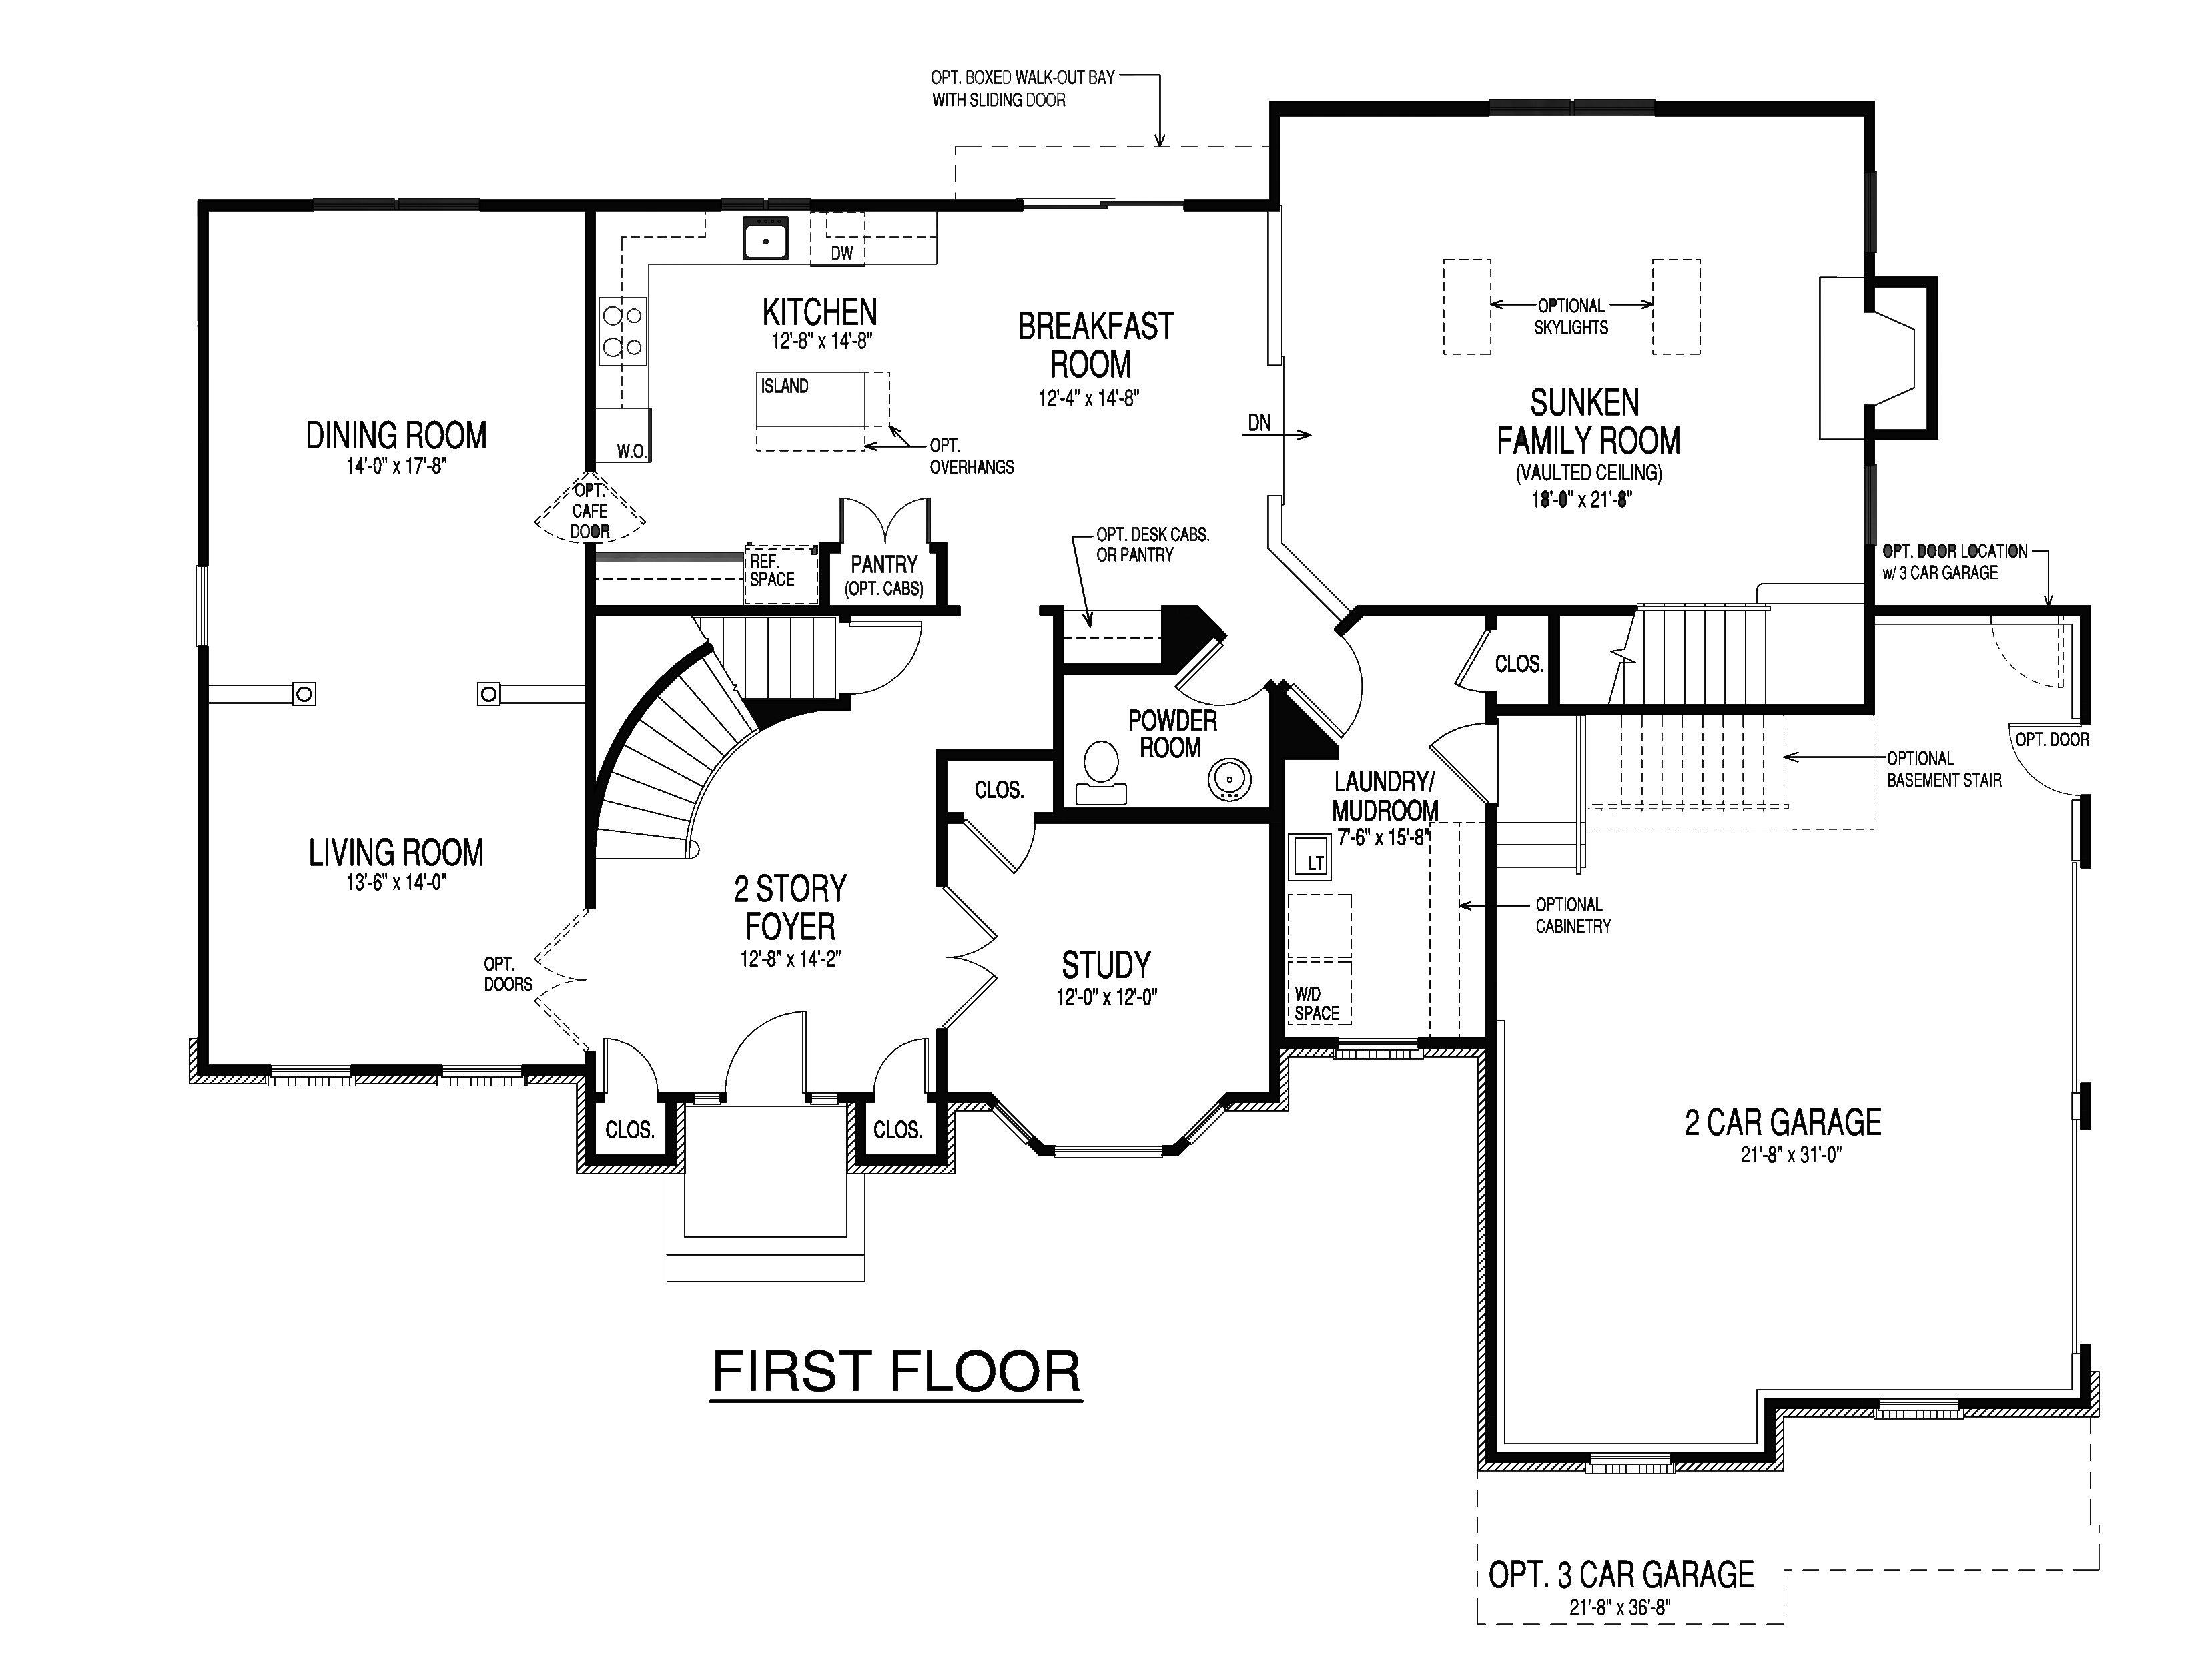 Classic Havilland First Floor